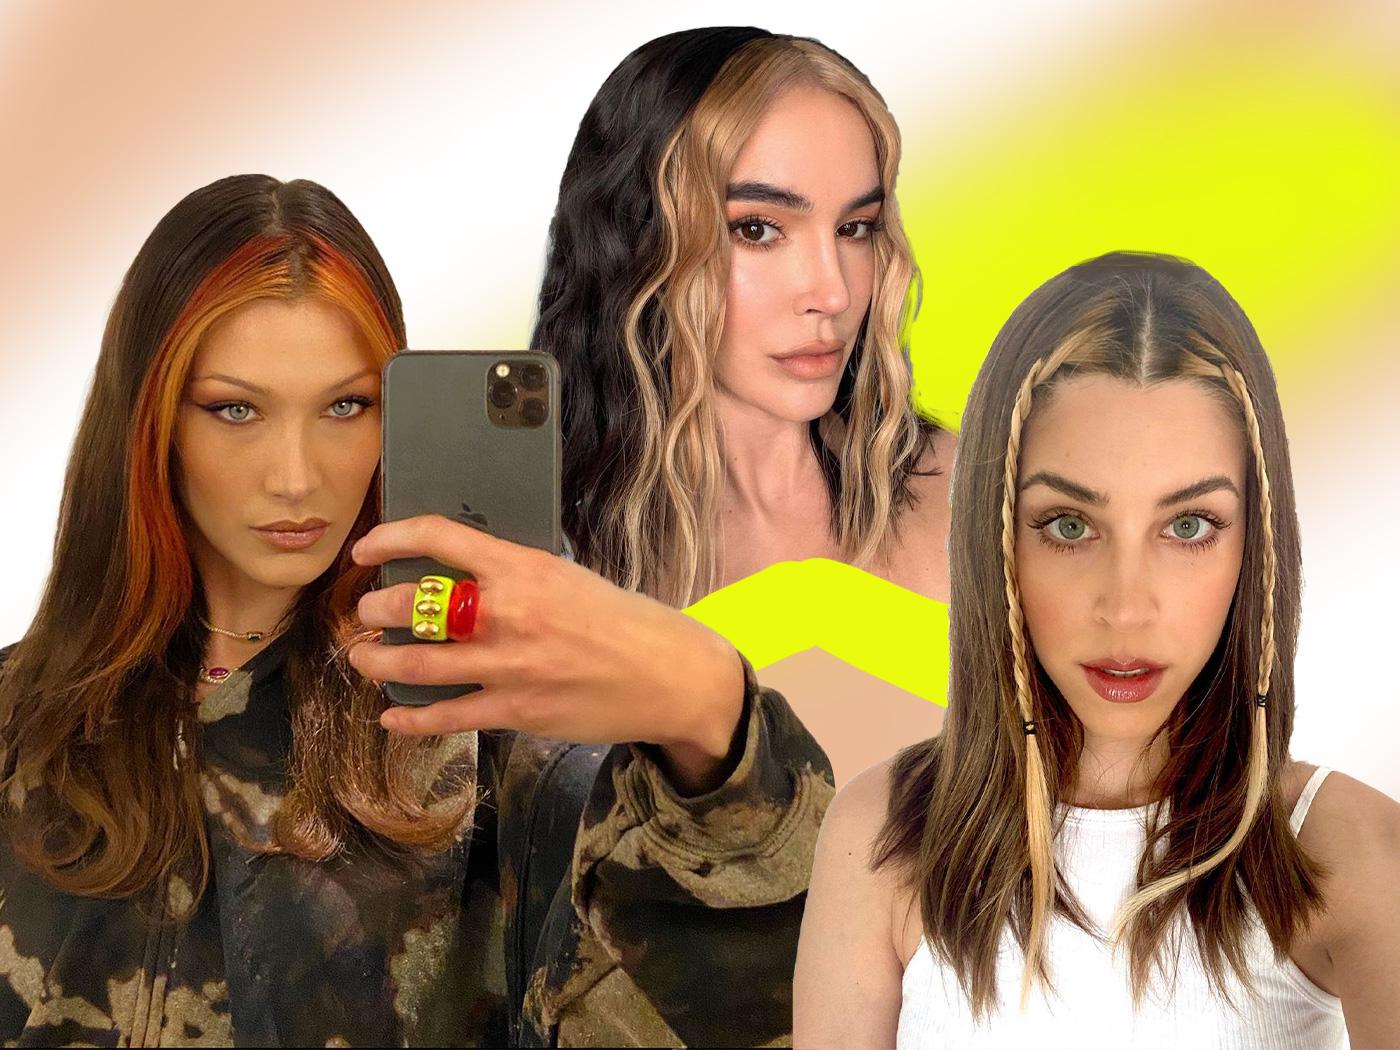 90's colourblocking: θα είναι ένα από τα μεγαλύτερα hair trends της άνοιξης και σου το μαθαίνουμε από τώρα